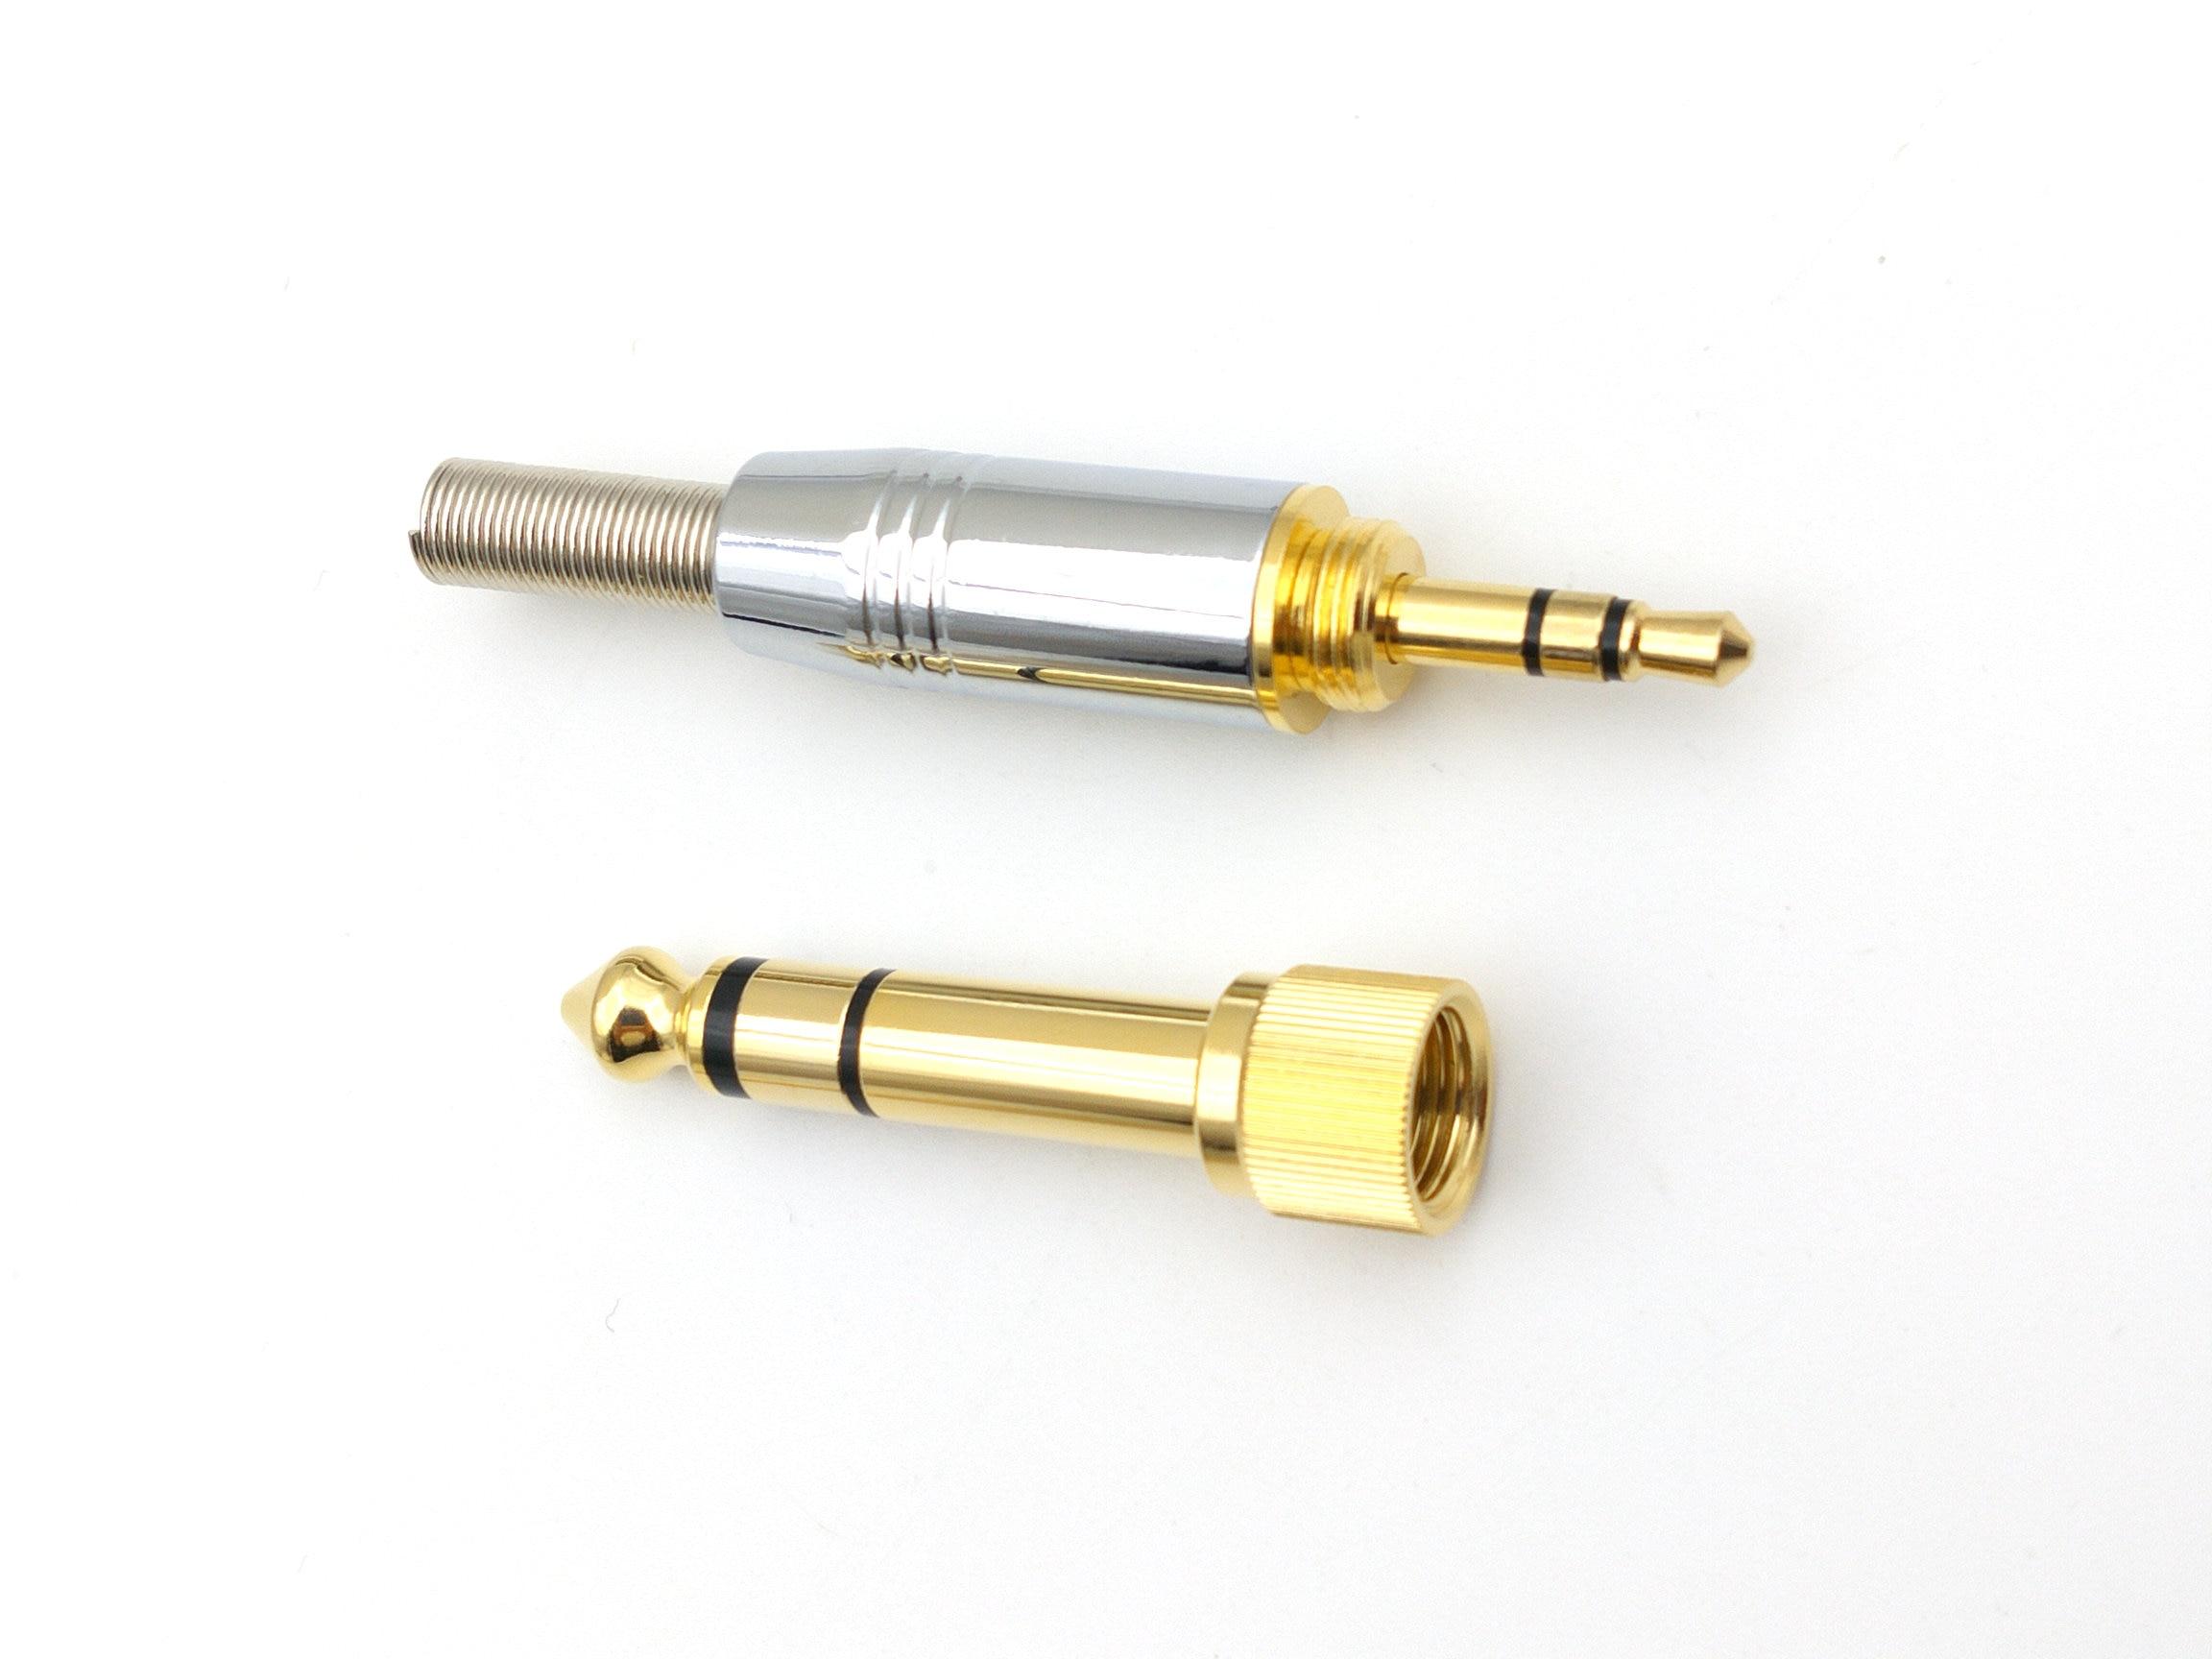 20set Self locking stereo plated 6 35mm revolution to 3 5mm self locking nut take male